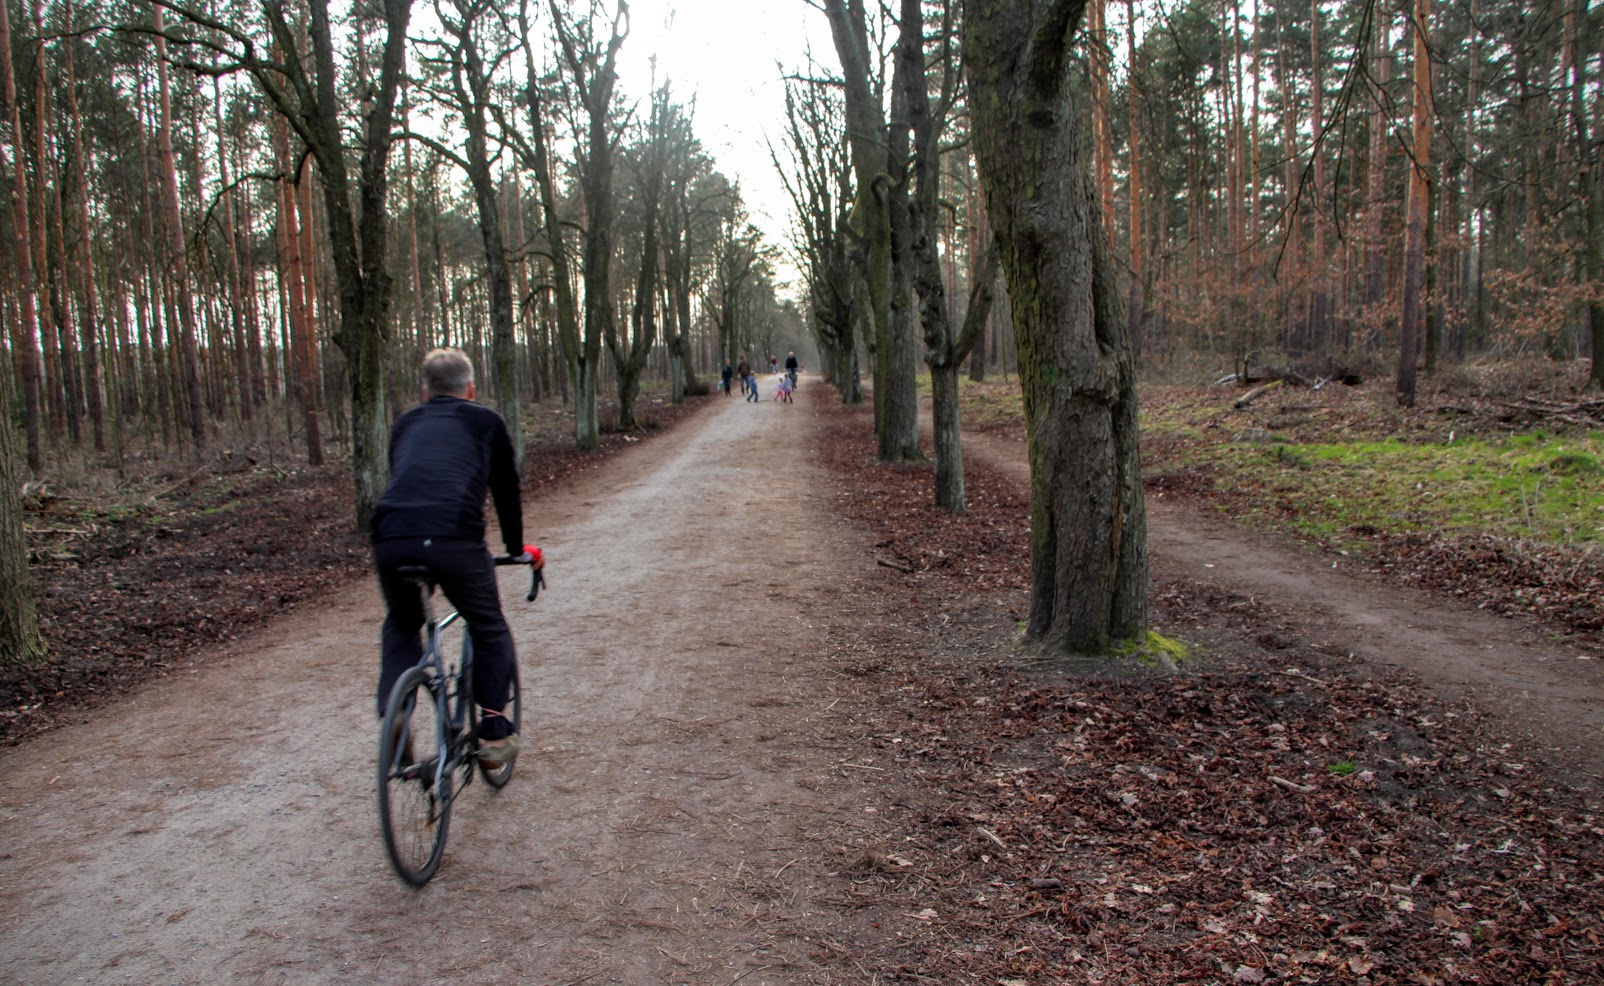 Grunewald Berlin Biking The Great Forest Of The German Capital